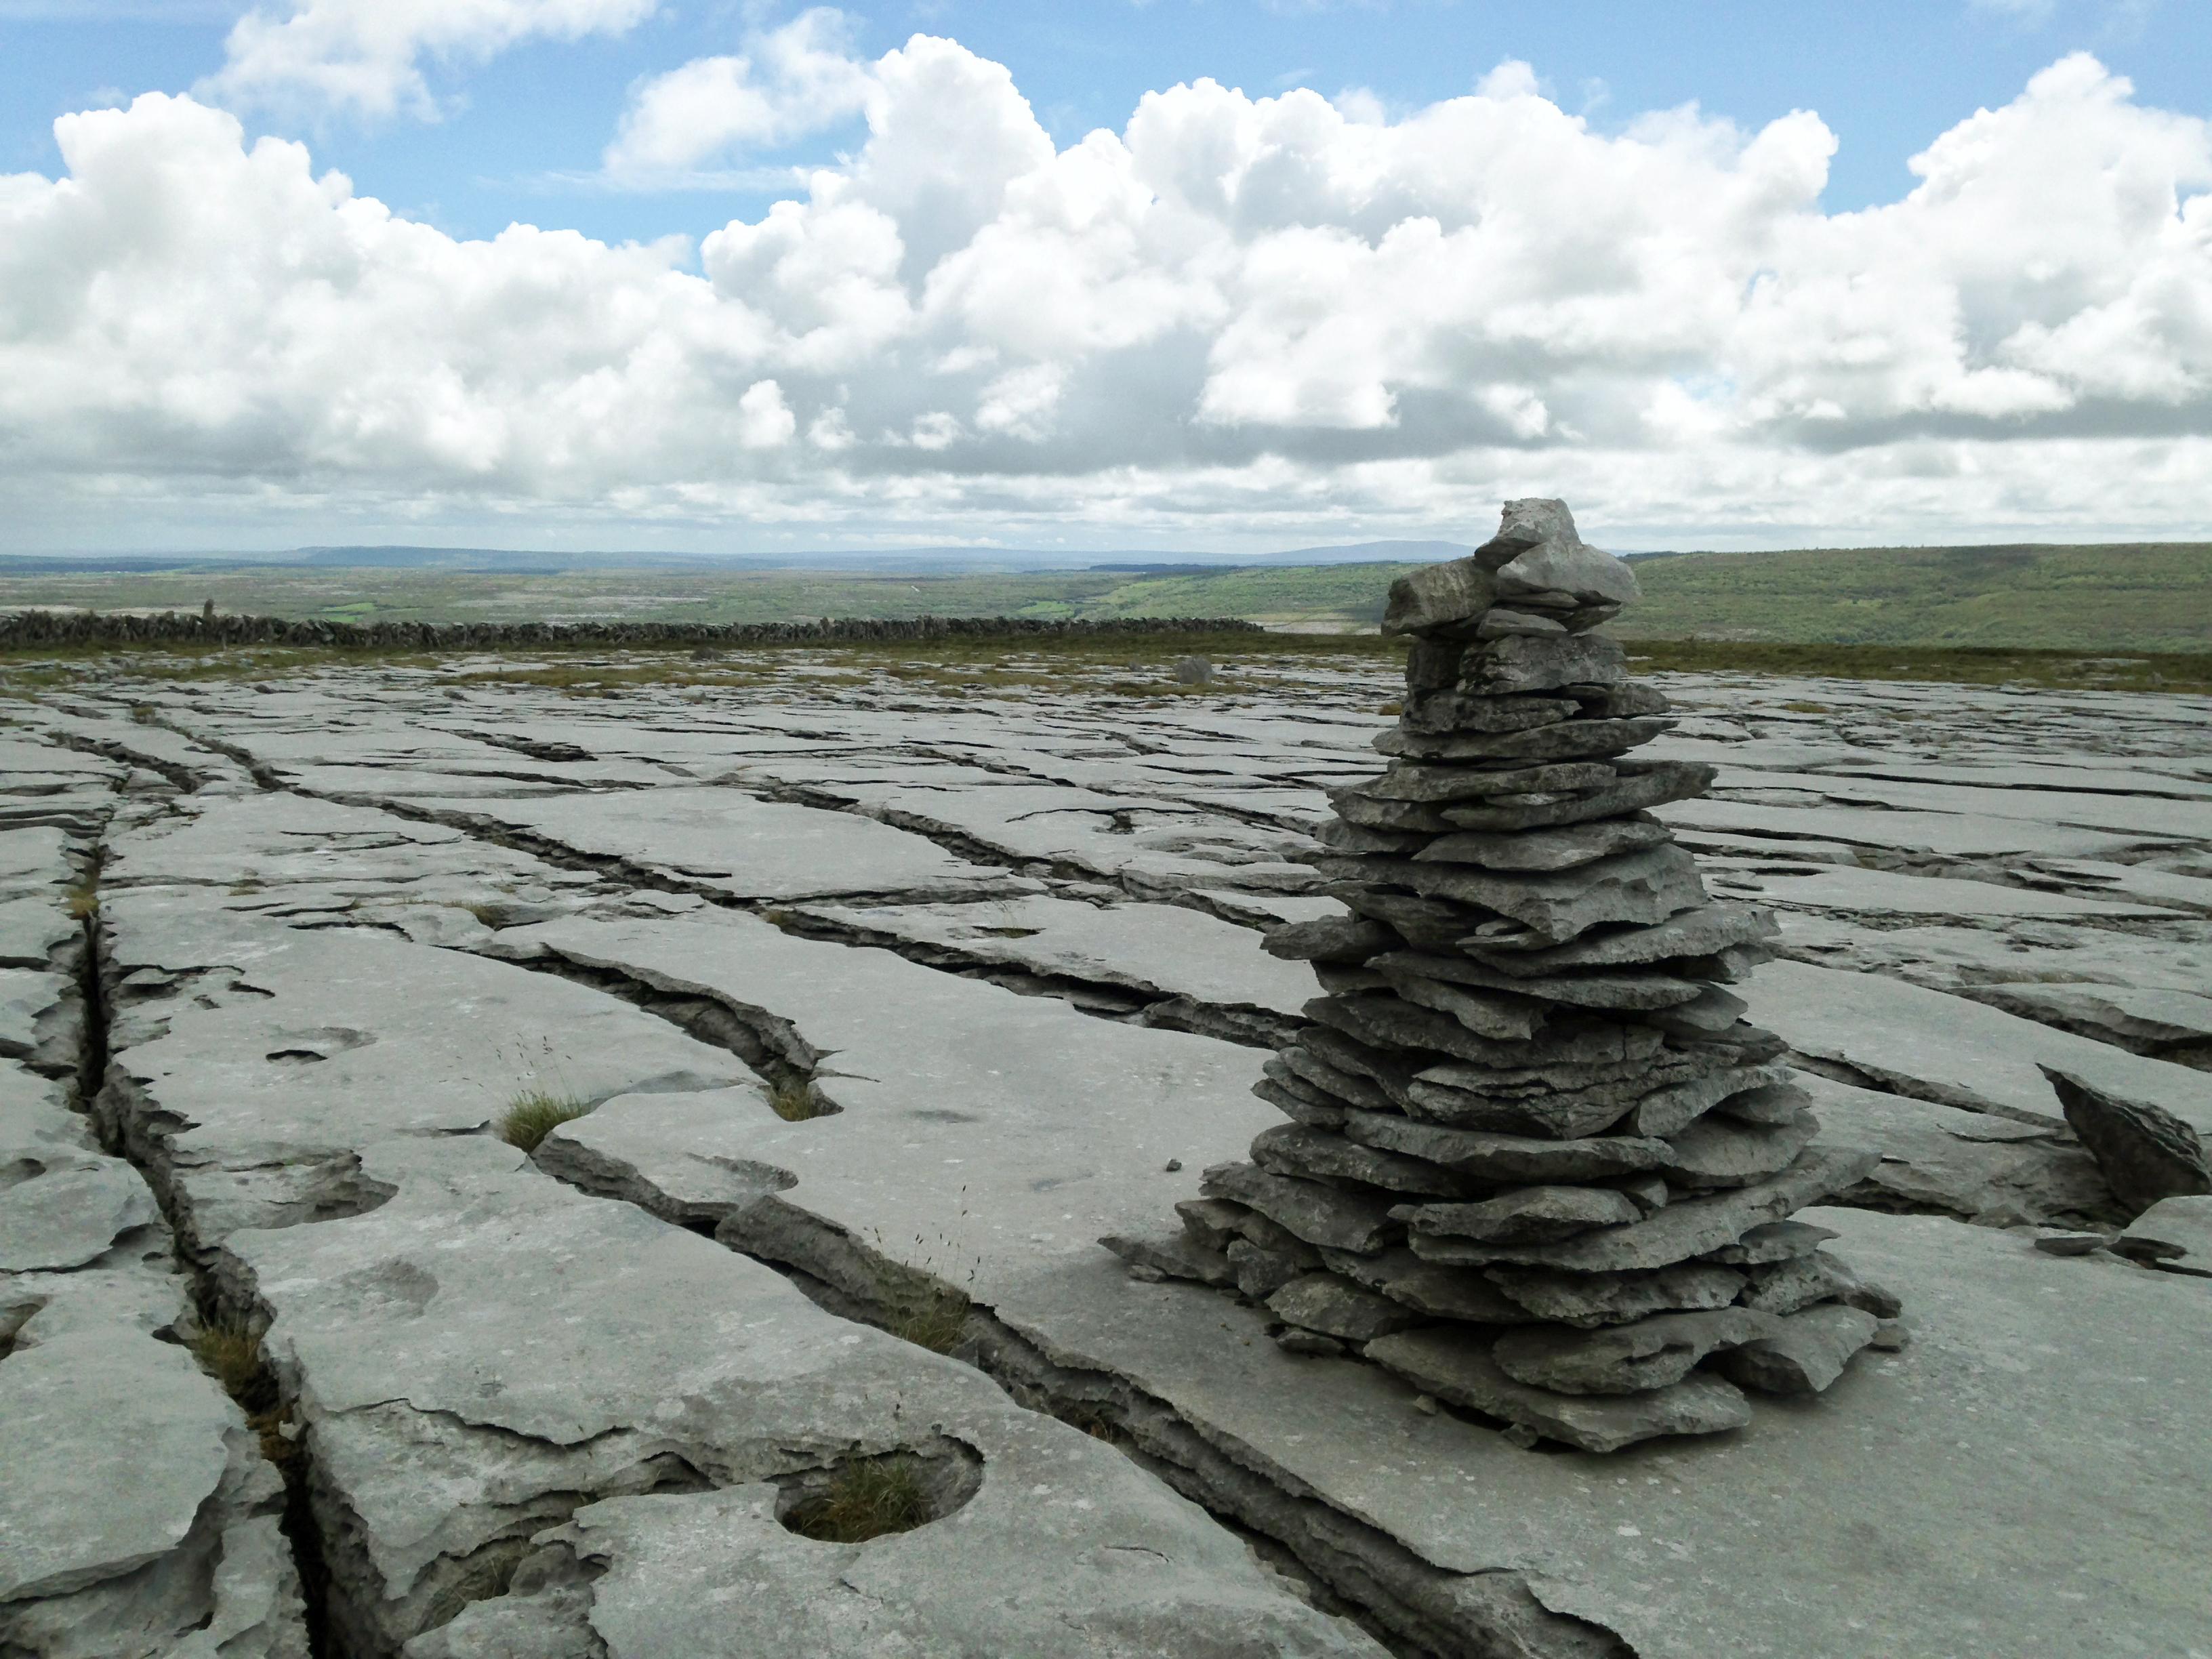 Photo of Cairn, Ireland